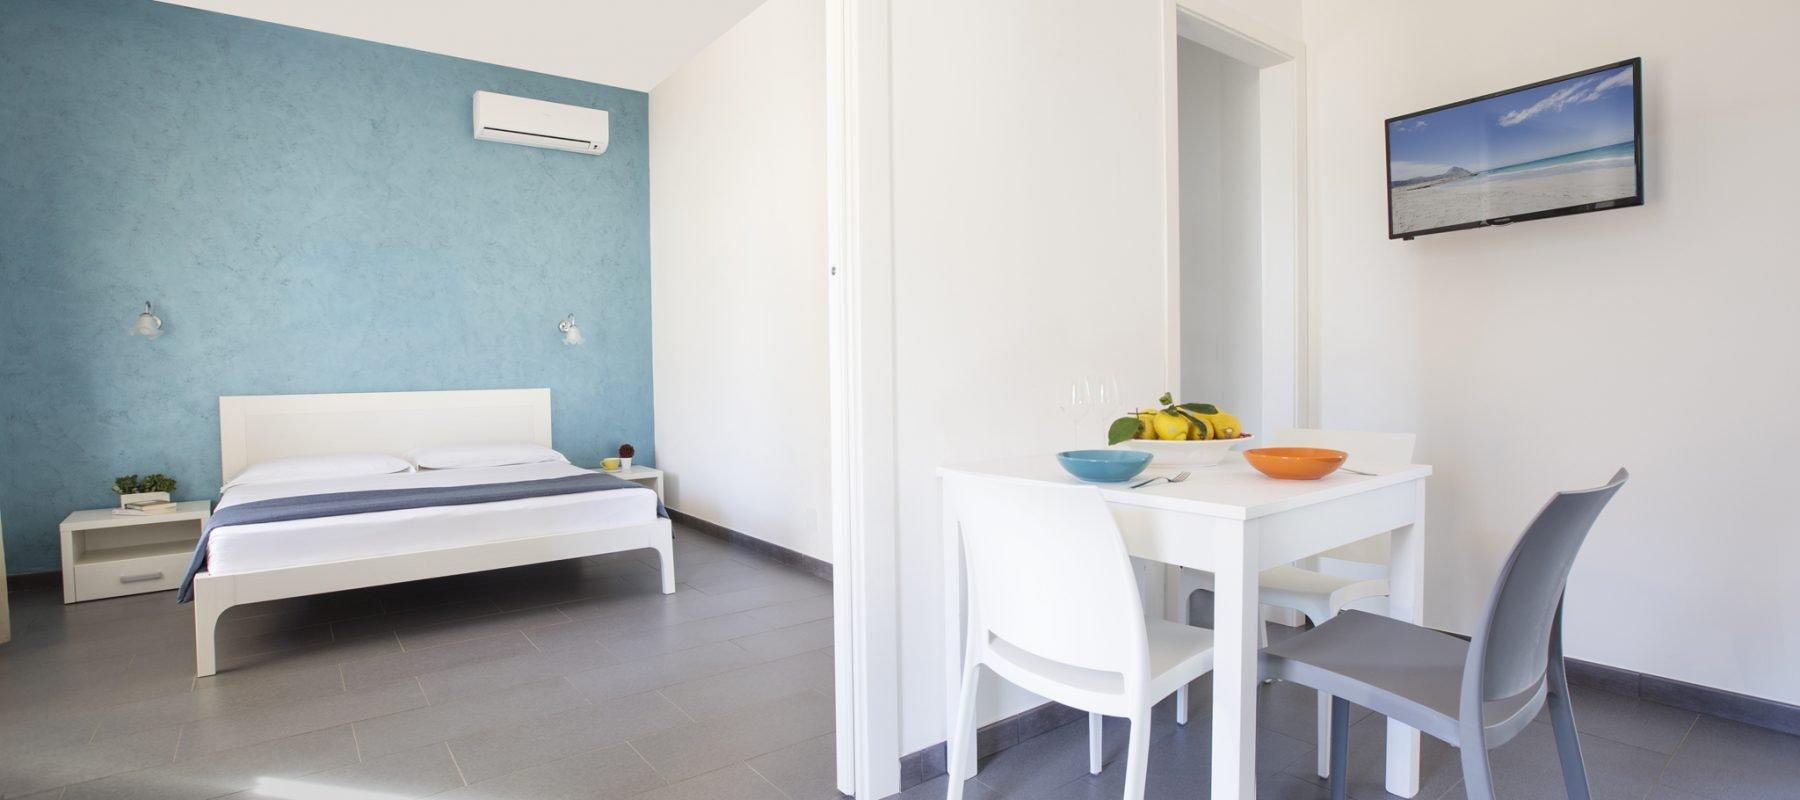 Appartamenti moderni e spaziosi